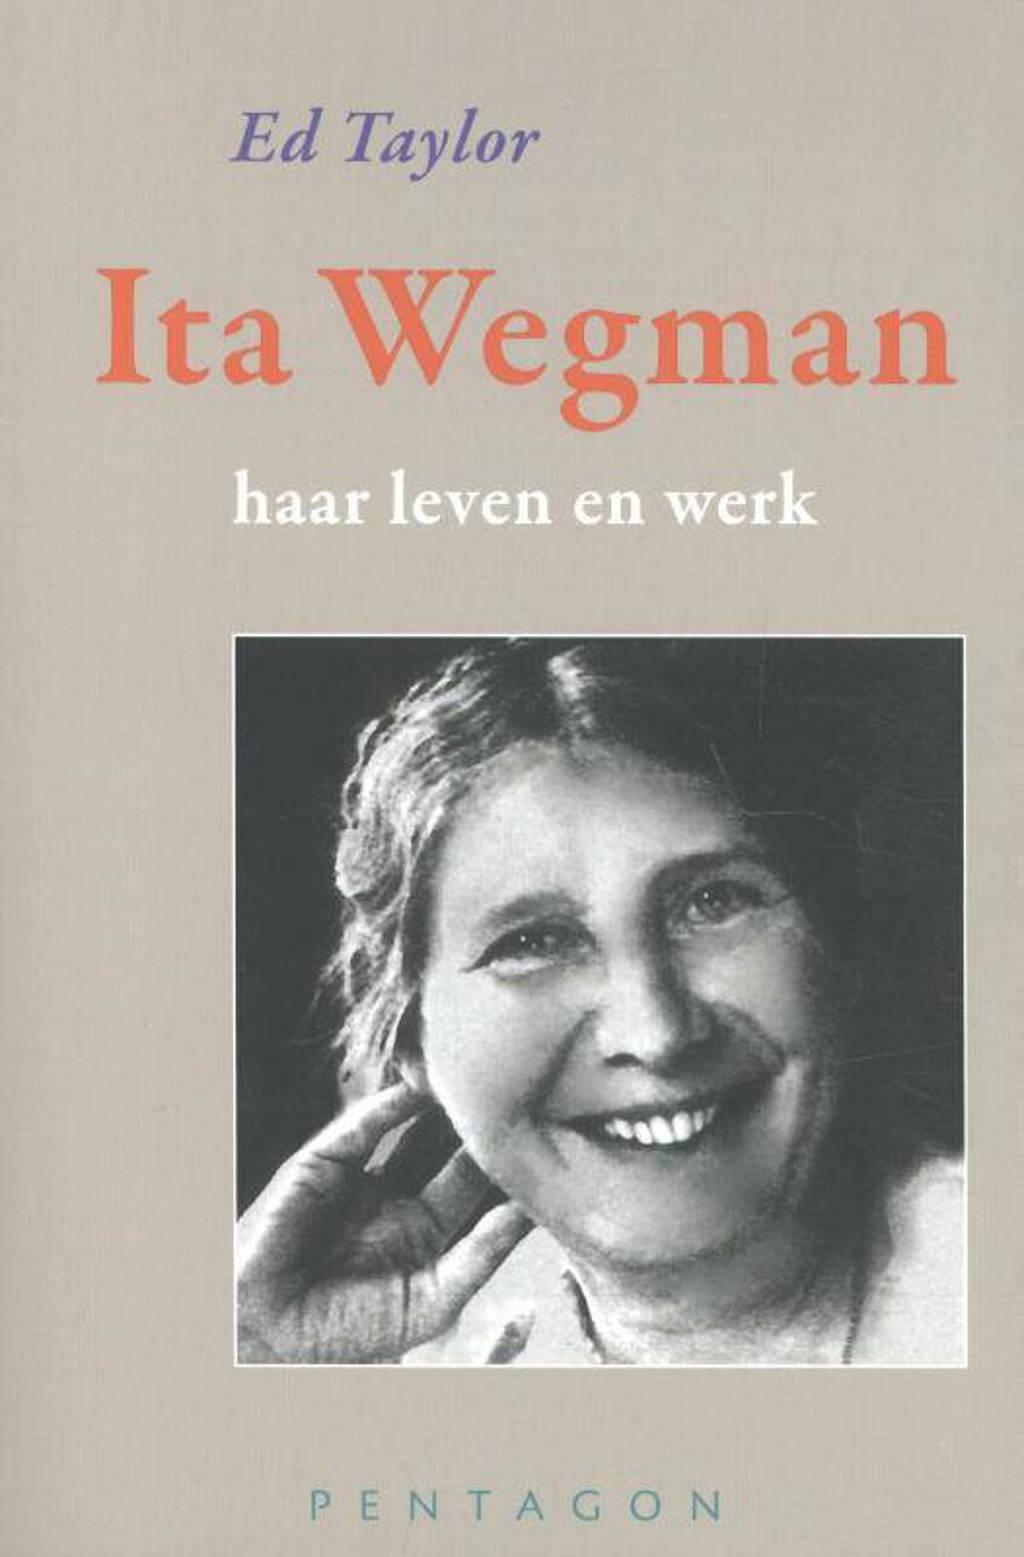 Ita Wegman - Ed Taylor